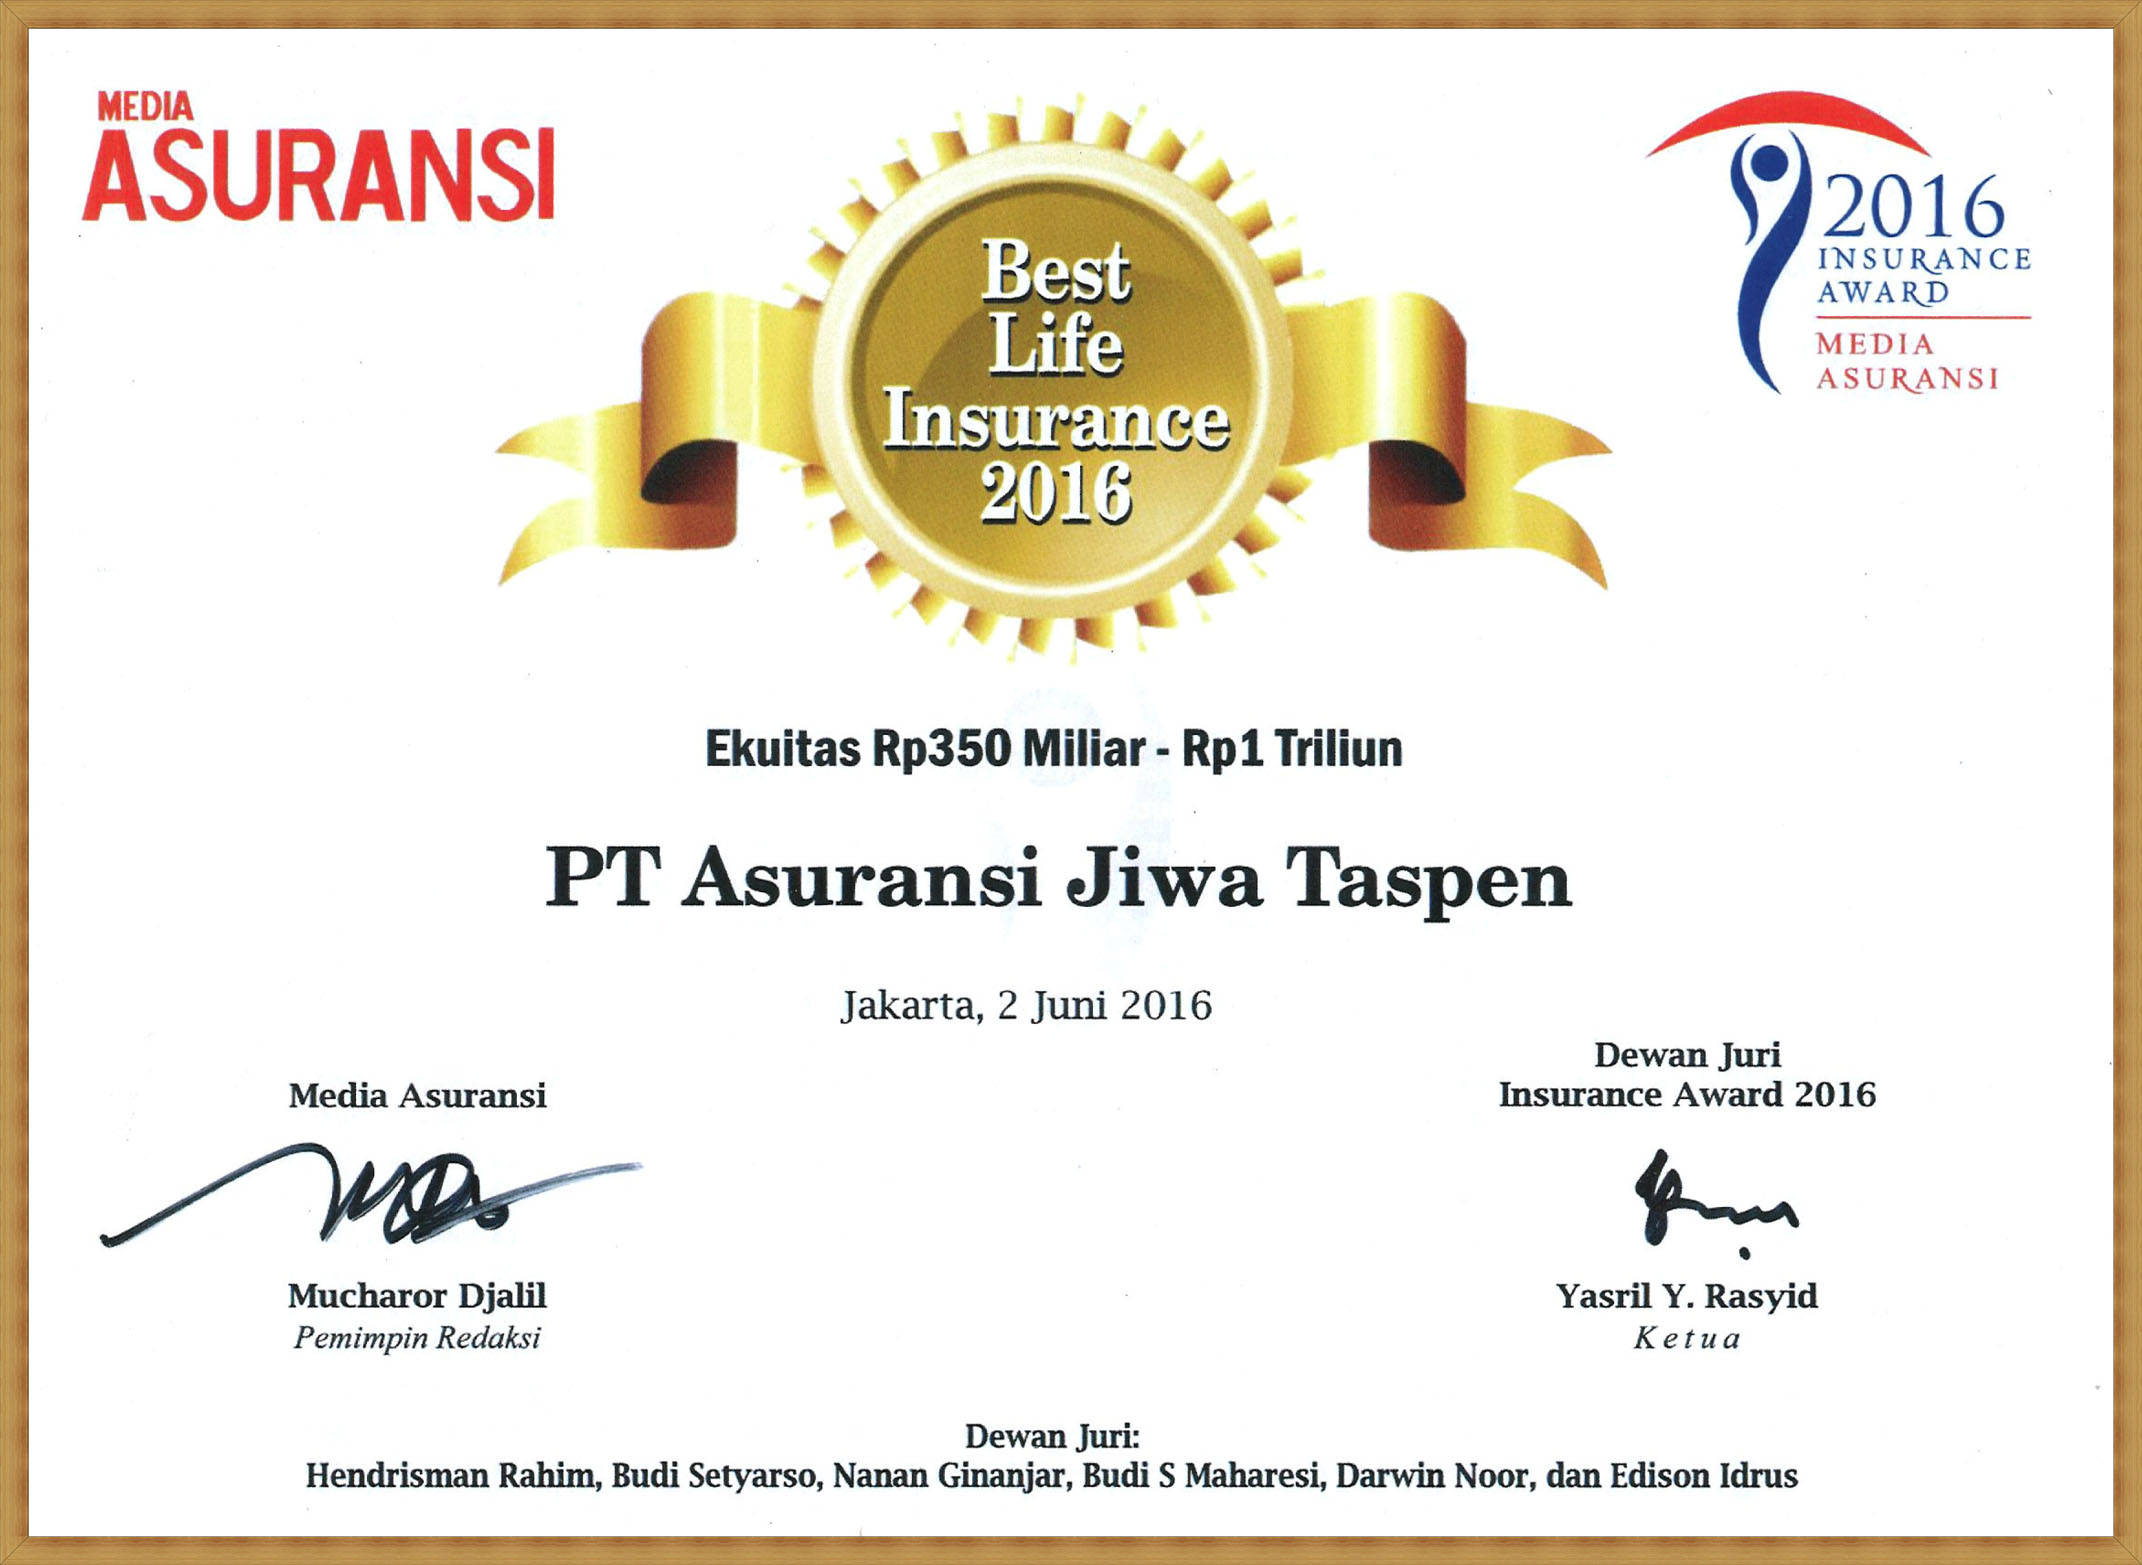 Best Life Insurance 2016